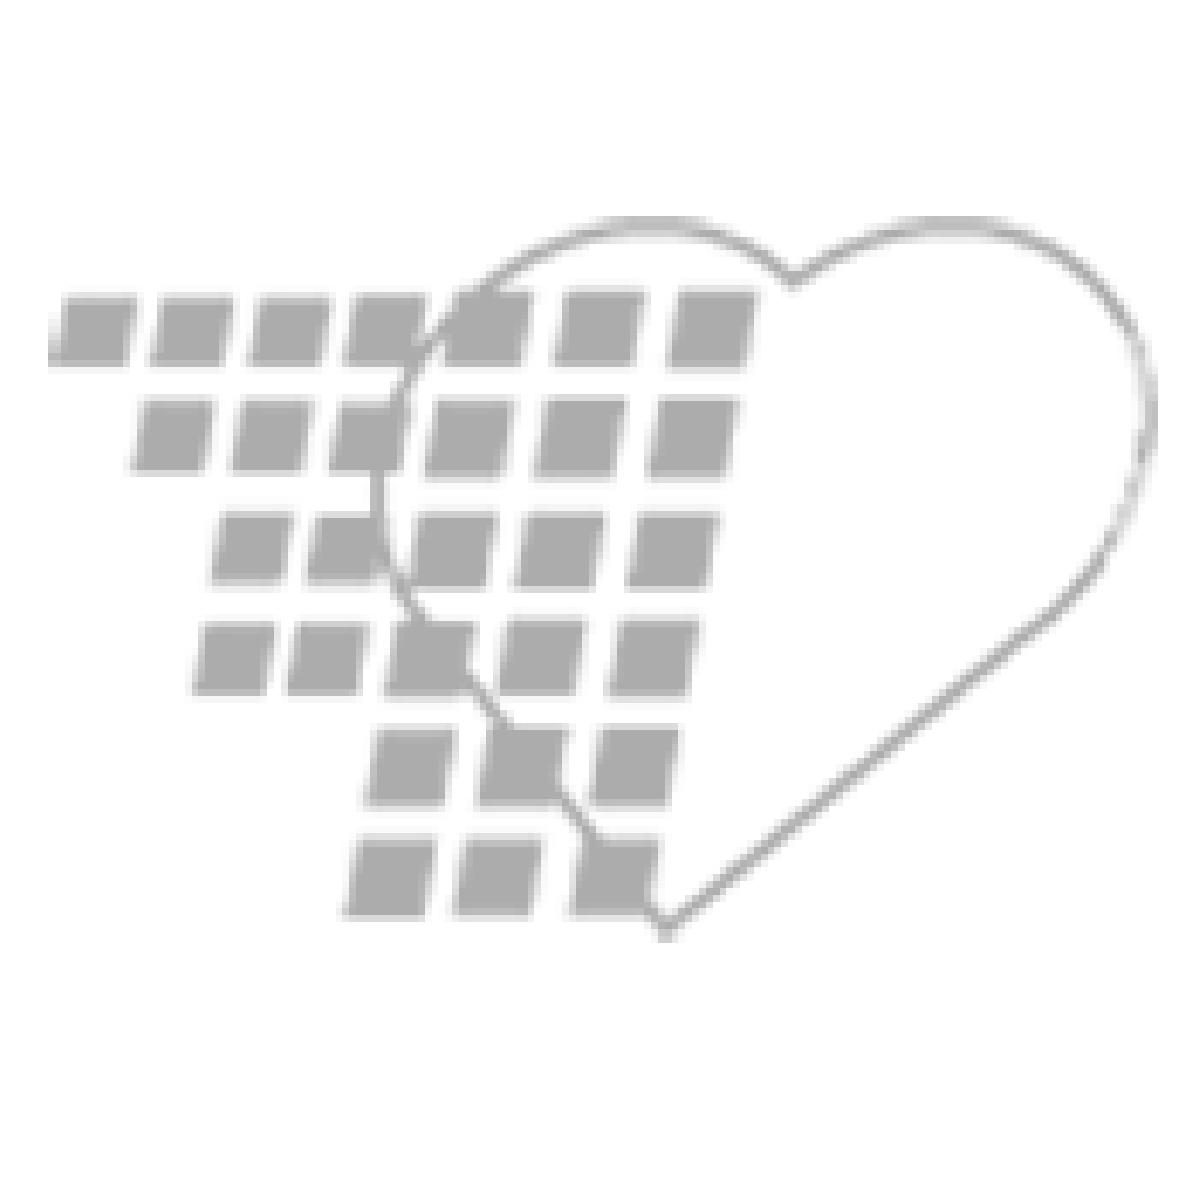 06-21-706P Scalp Vein Set BSV/Butterfly Small Vein Infusion